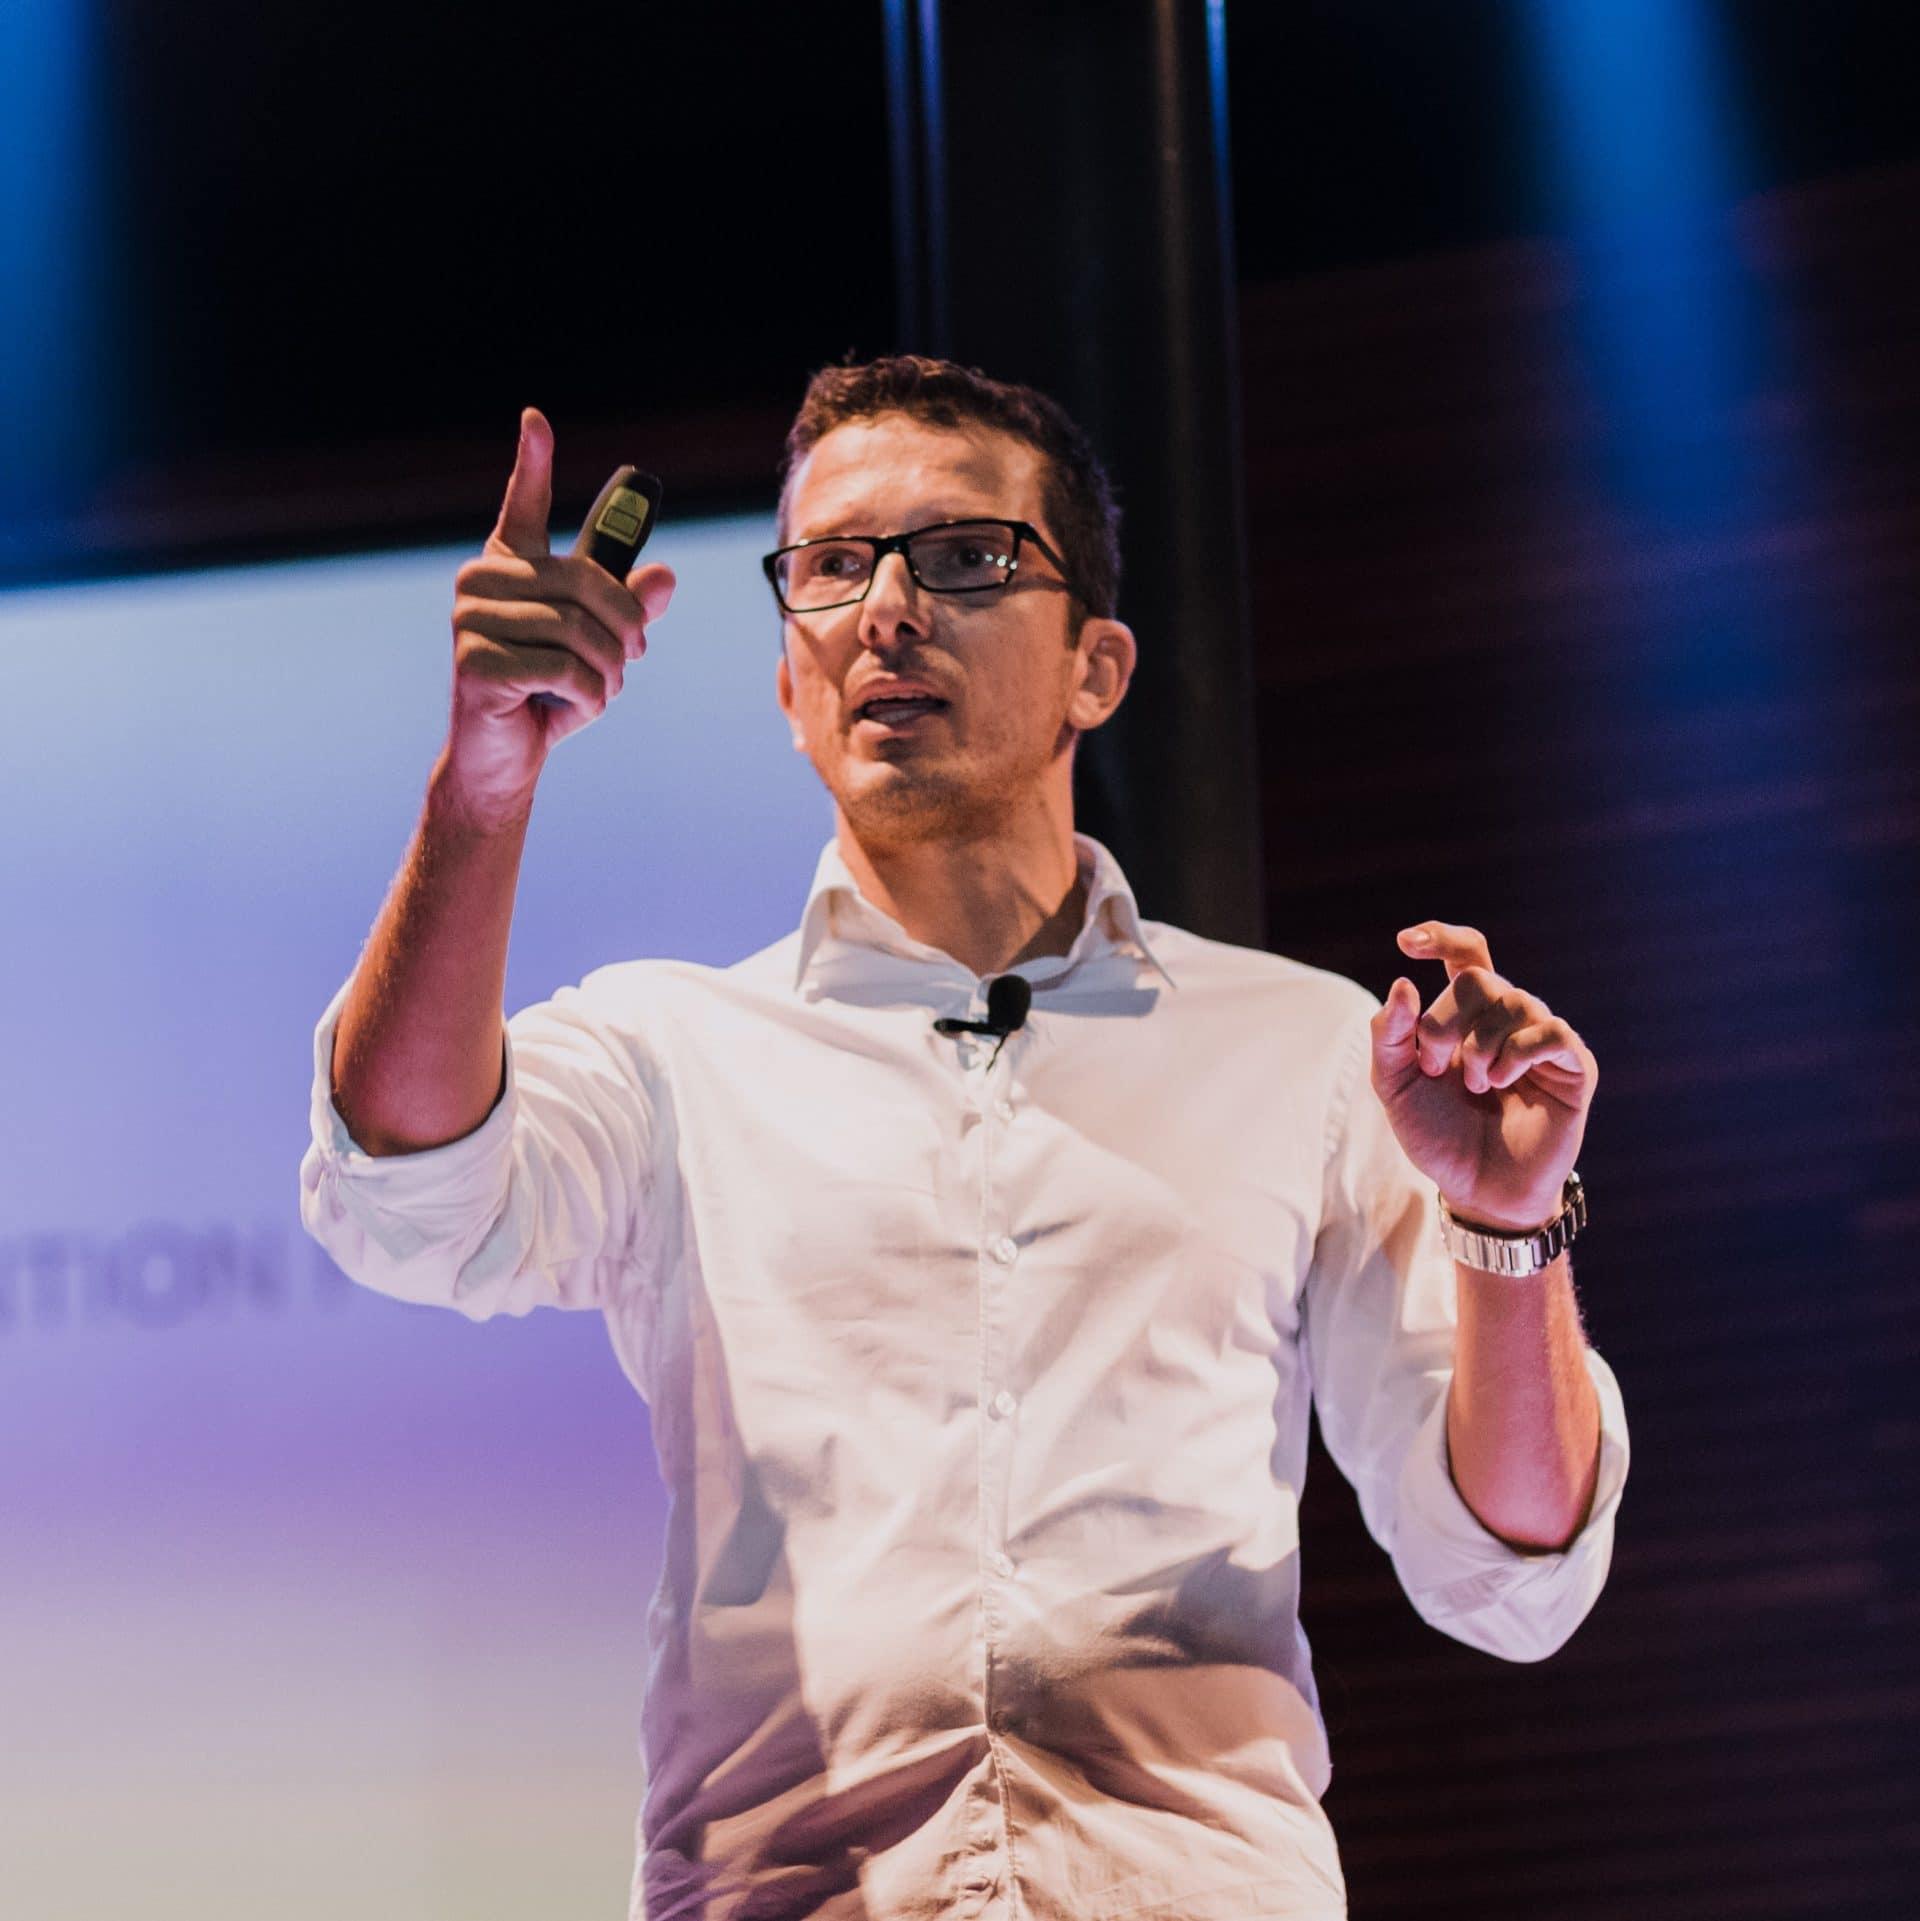 savvas-trichas-keynote-speaker